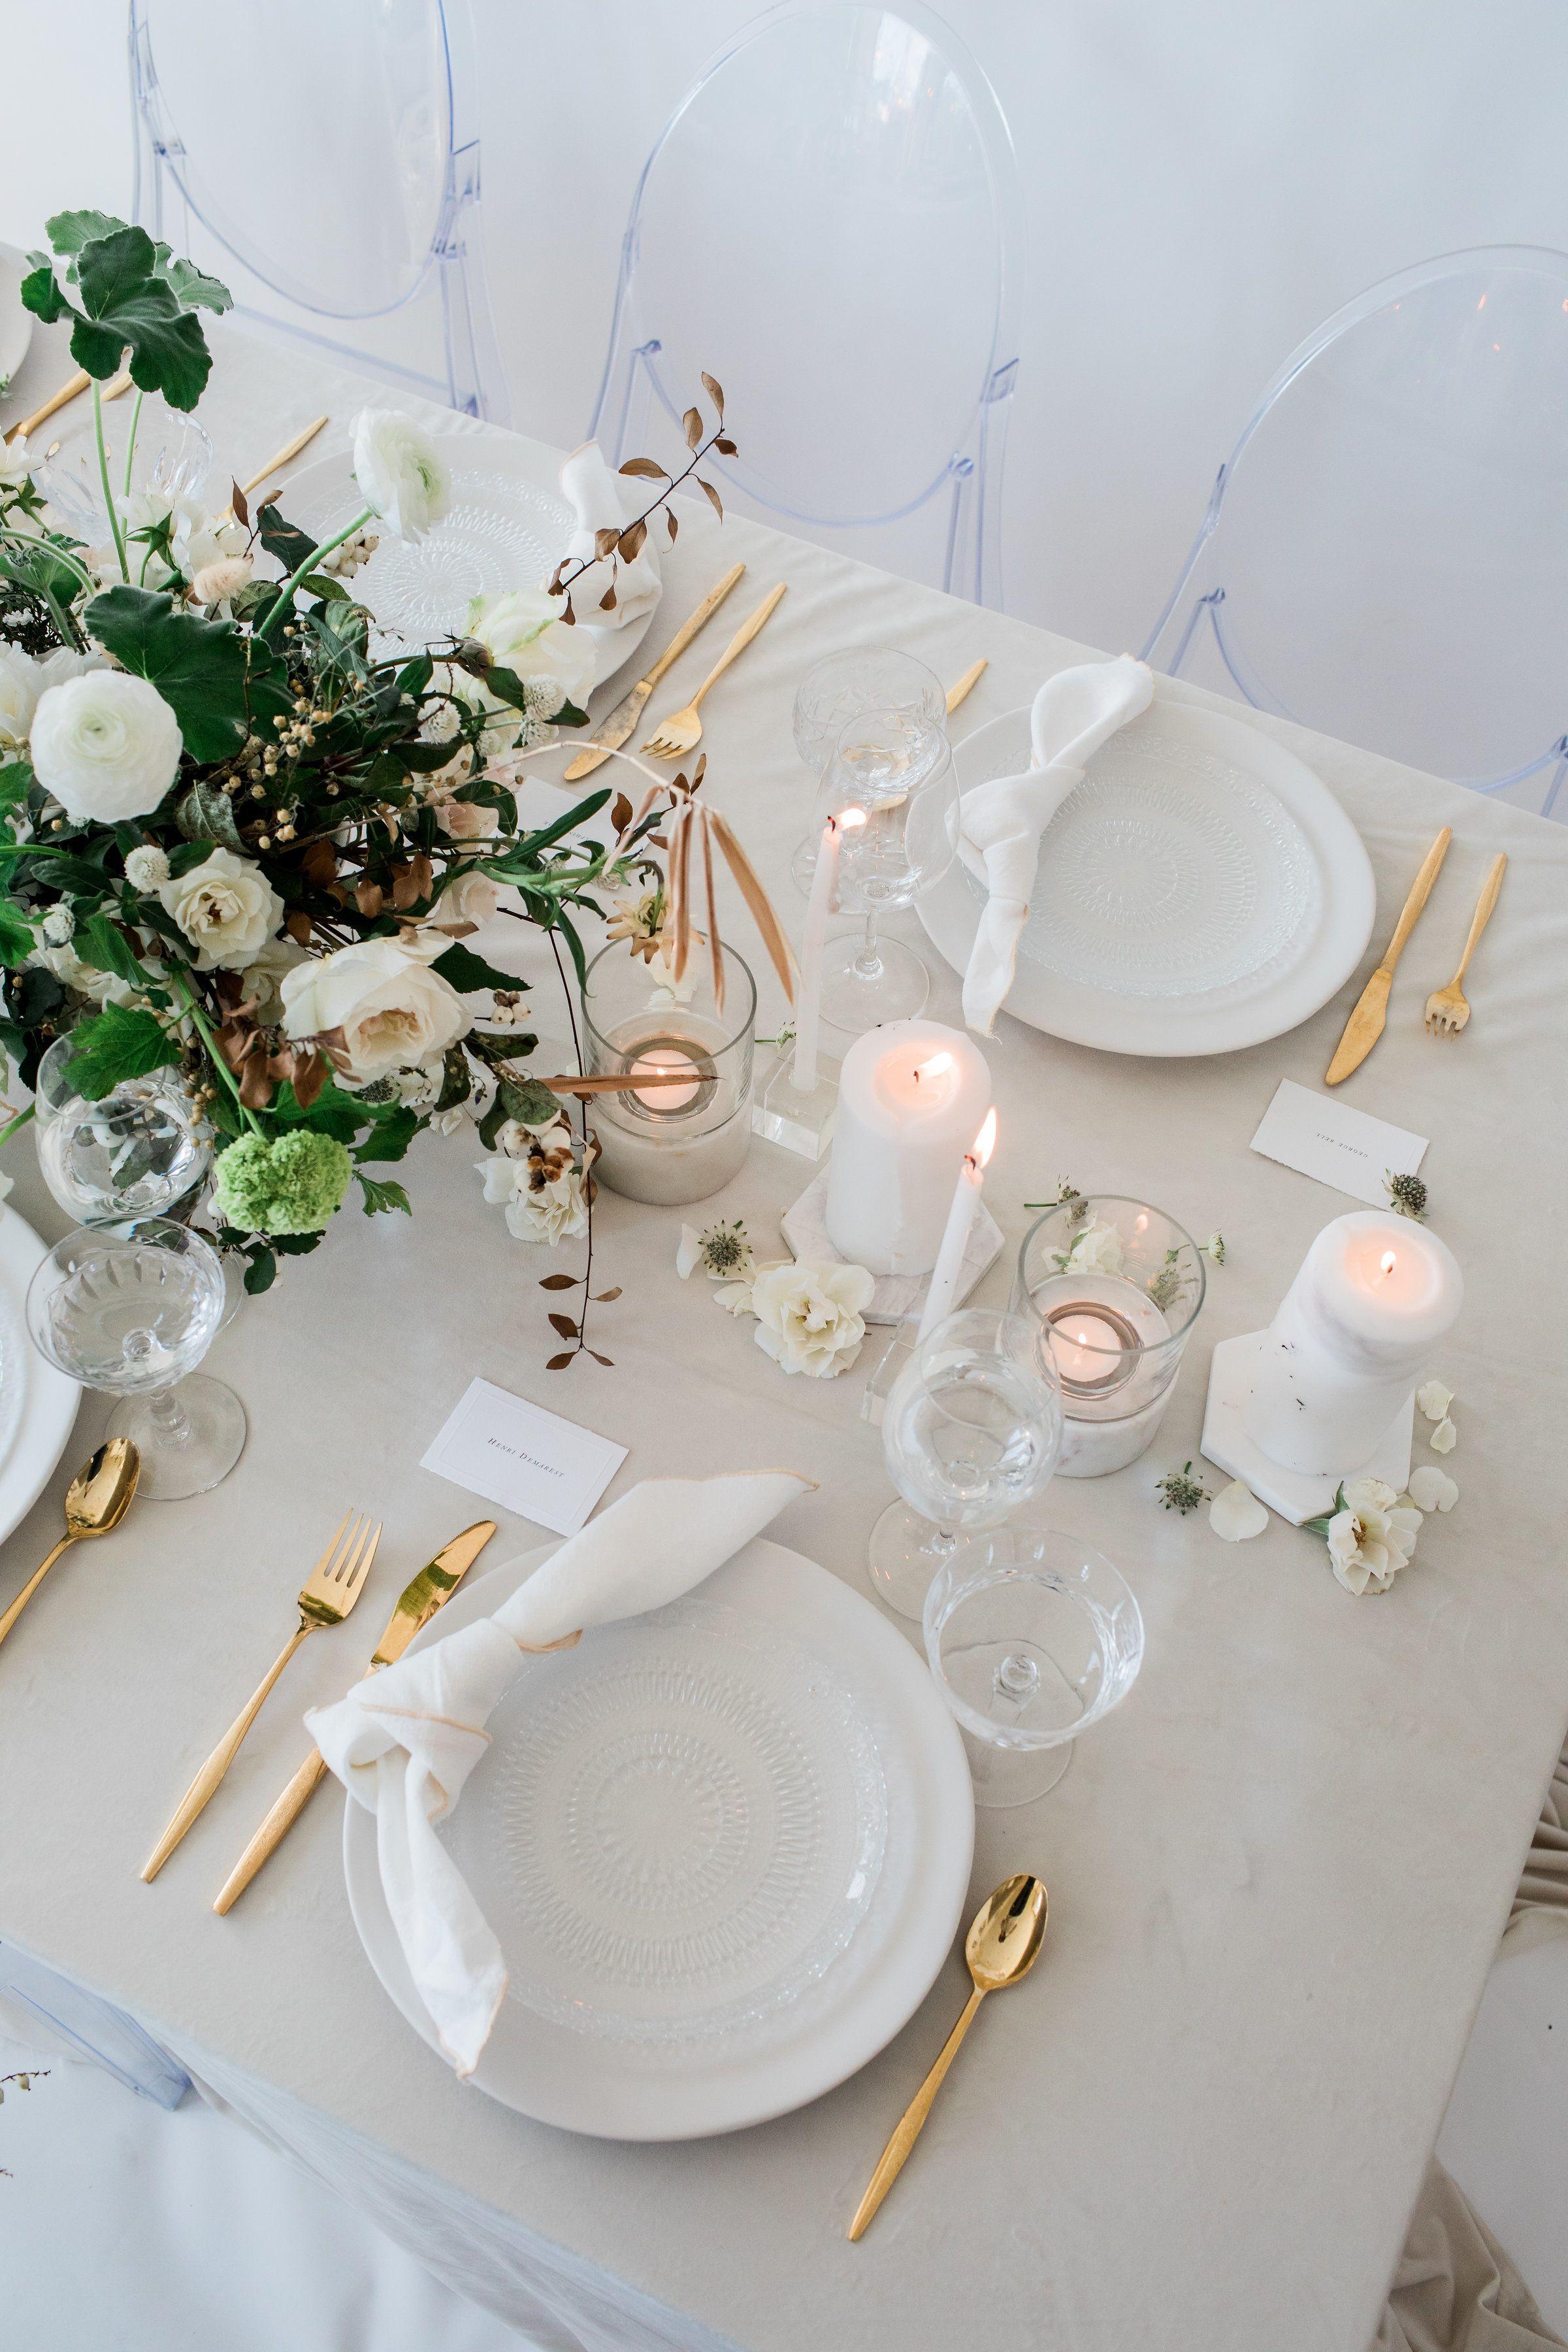 La Tavola Fine Linen Rental: Velvet Oatmeal | Photography: Natalie Bray Studios, Floral Design: Native Poppy, Tabletop: Hostess Haven, Paper Goods: Shasta Bell Calligraphy